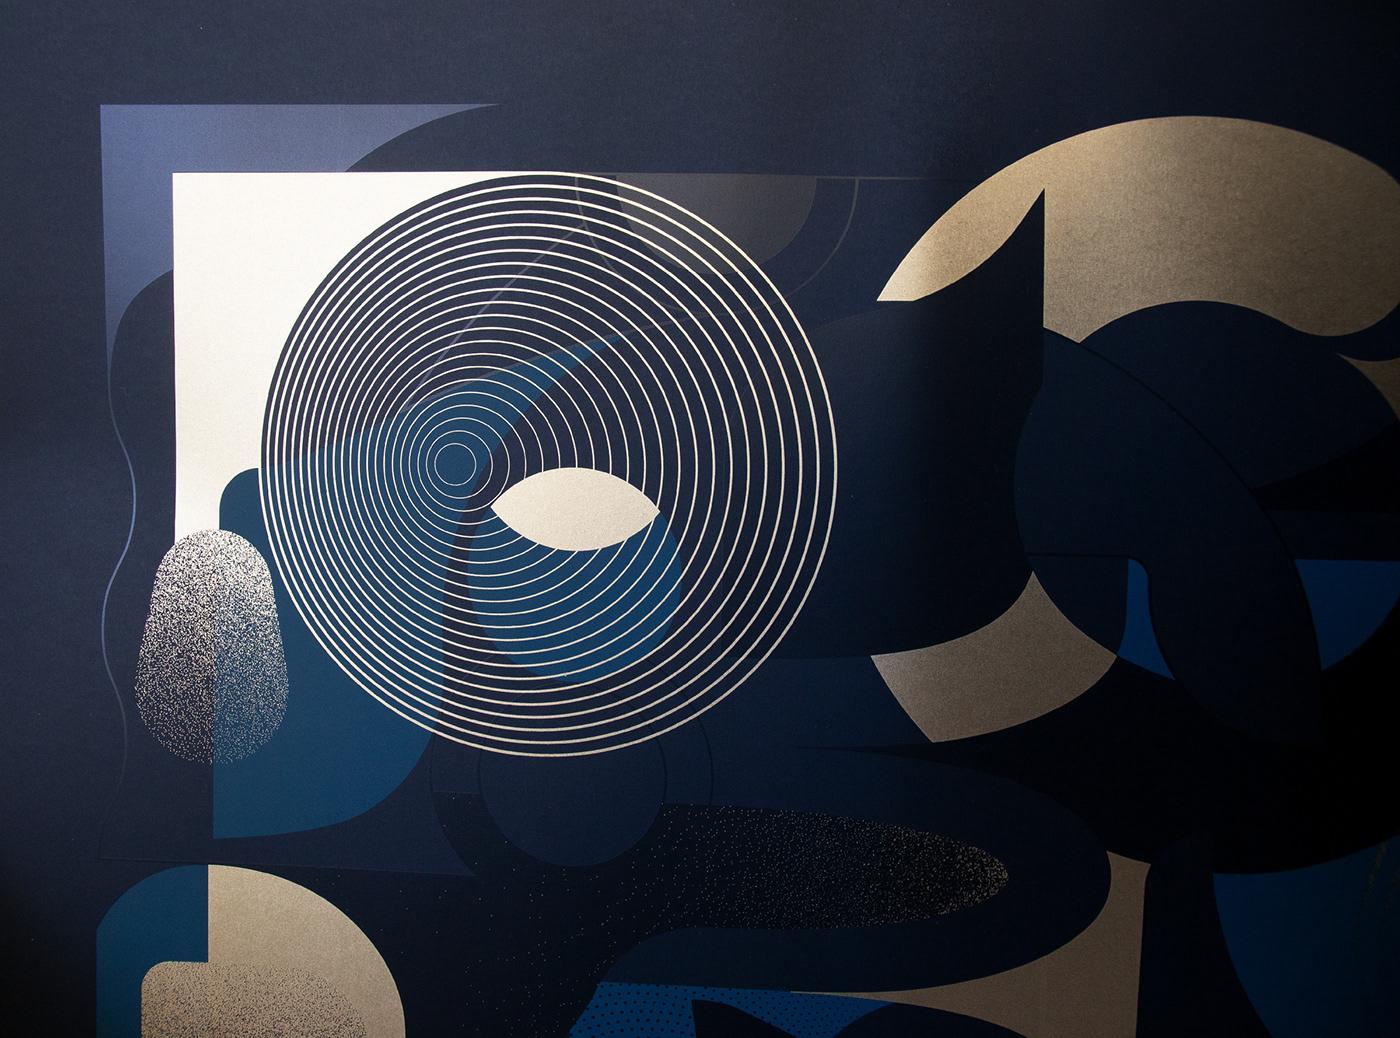 affiches,Arjowiggins,Edition Limitée,fedrigoni,limited edition,sérigraphie,shop,silk-screen,vente,On sale